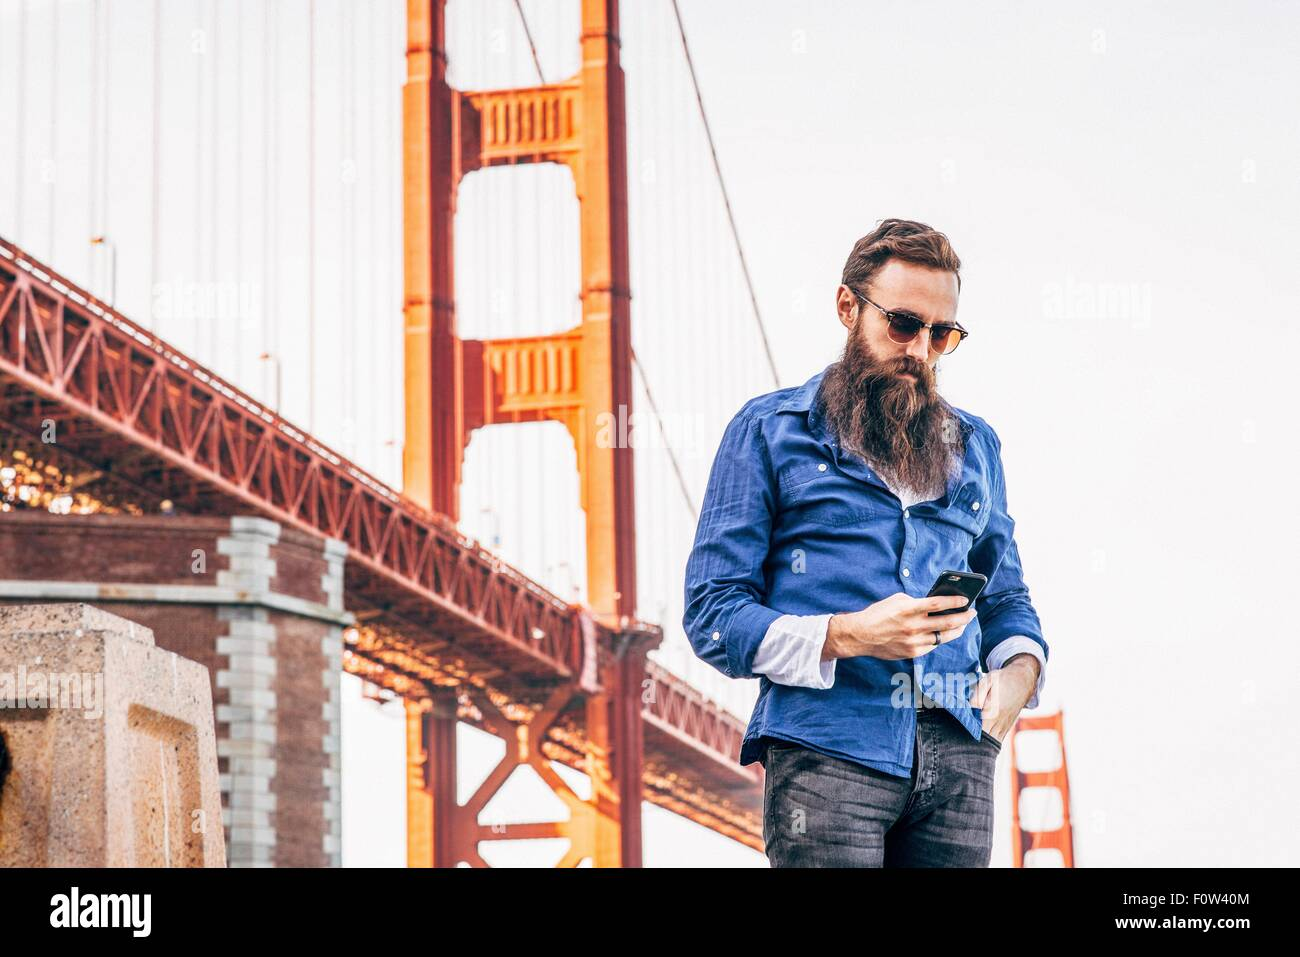 Man with beard checking smartphone at Golden Gate Bridge, San Francisco, California, USA - Stock Image